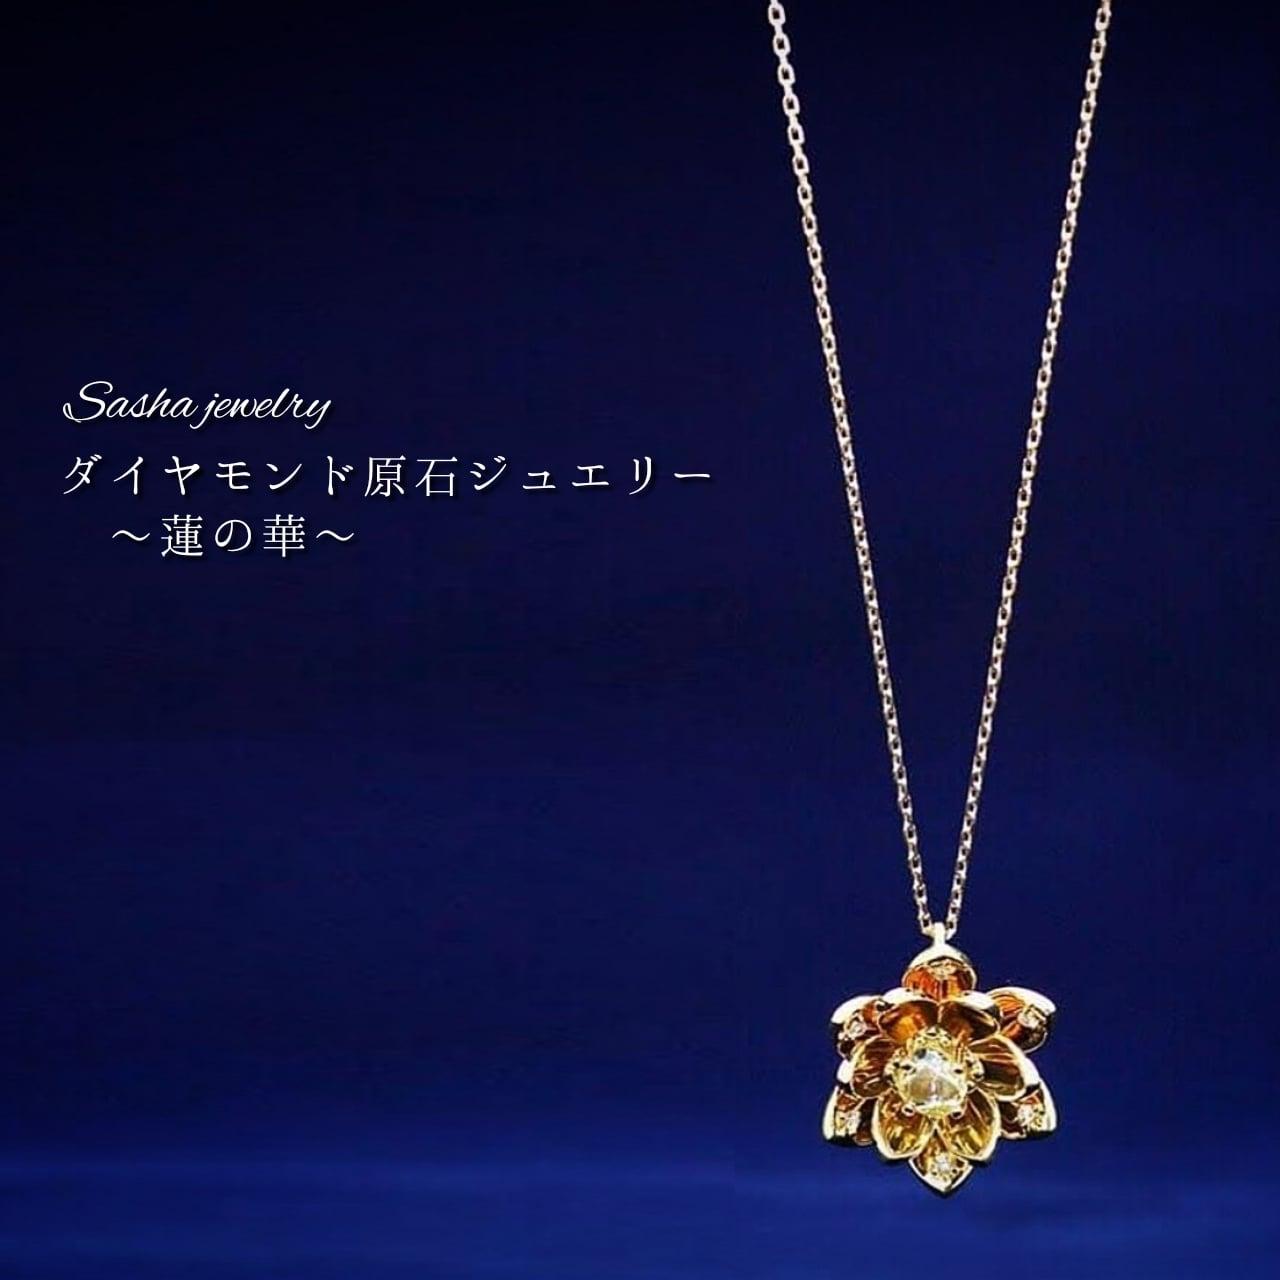 Sasha jewelry*ダイヤモンド原石ジュエリー〜蓮の華〜(宝石セッション、ペンダントトップ、チェーン含む)のイメージその1